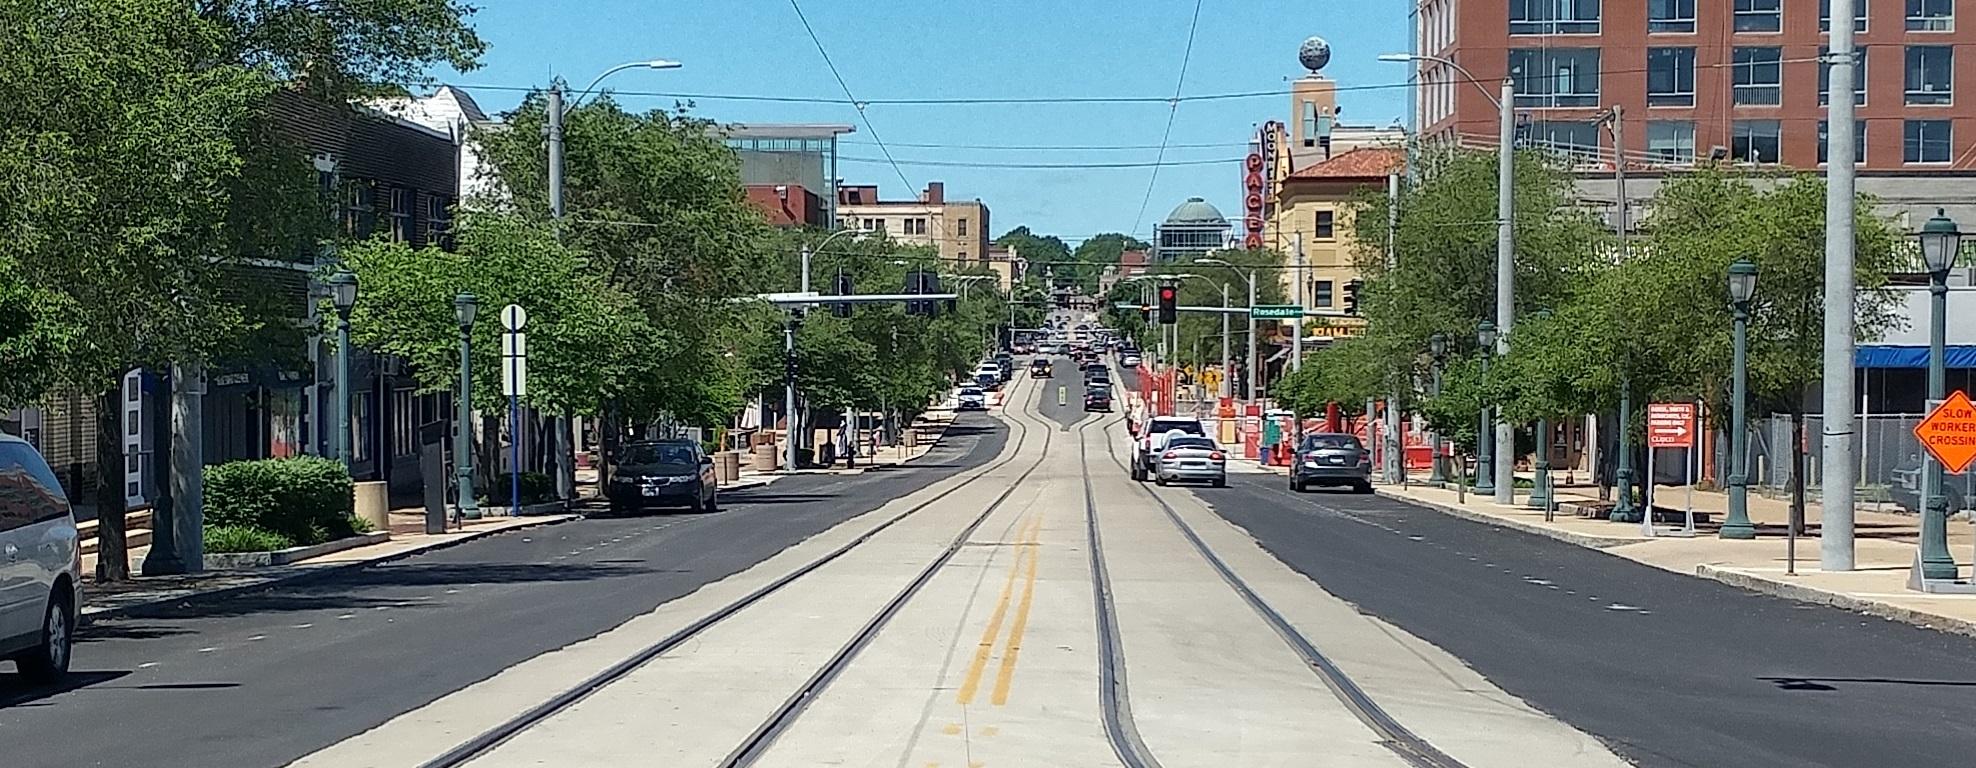 Loop Trolley Corridor Photo Tour: Delmar from Des Peres to Limit